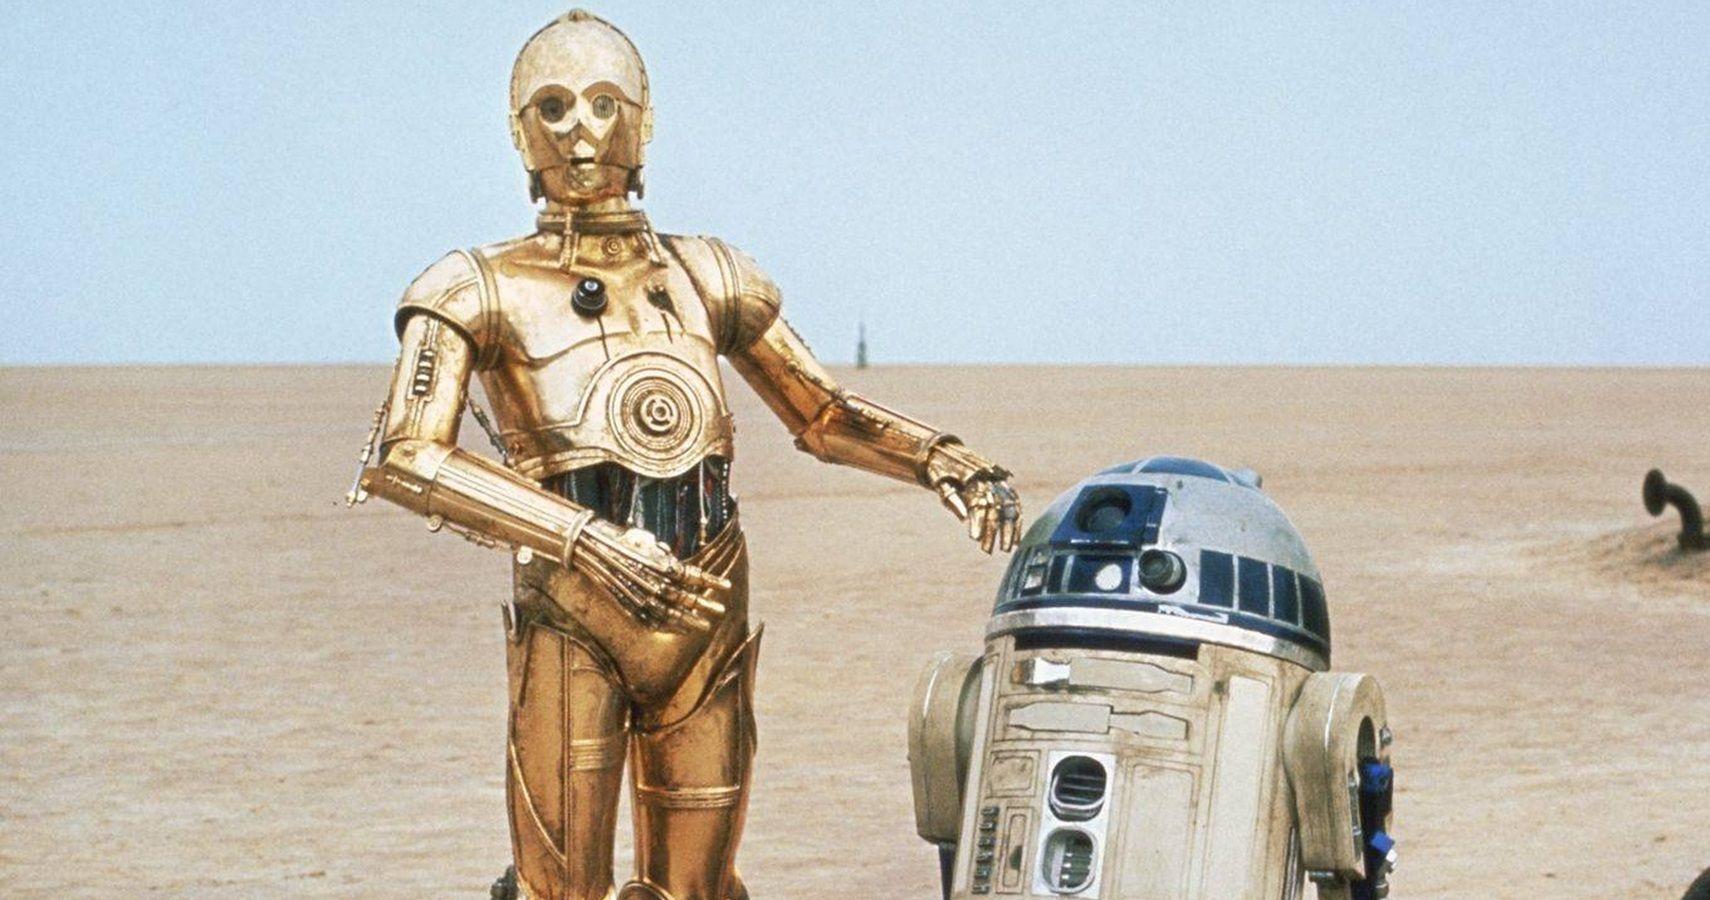 Star Wars: R2-D2 & C-3PO's 10 Best Scenes, Ranked | ScreenRant